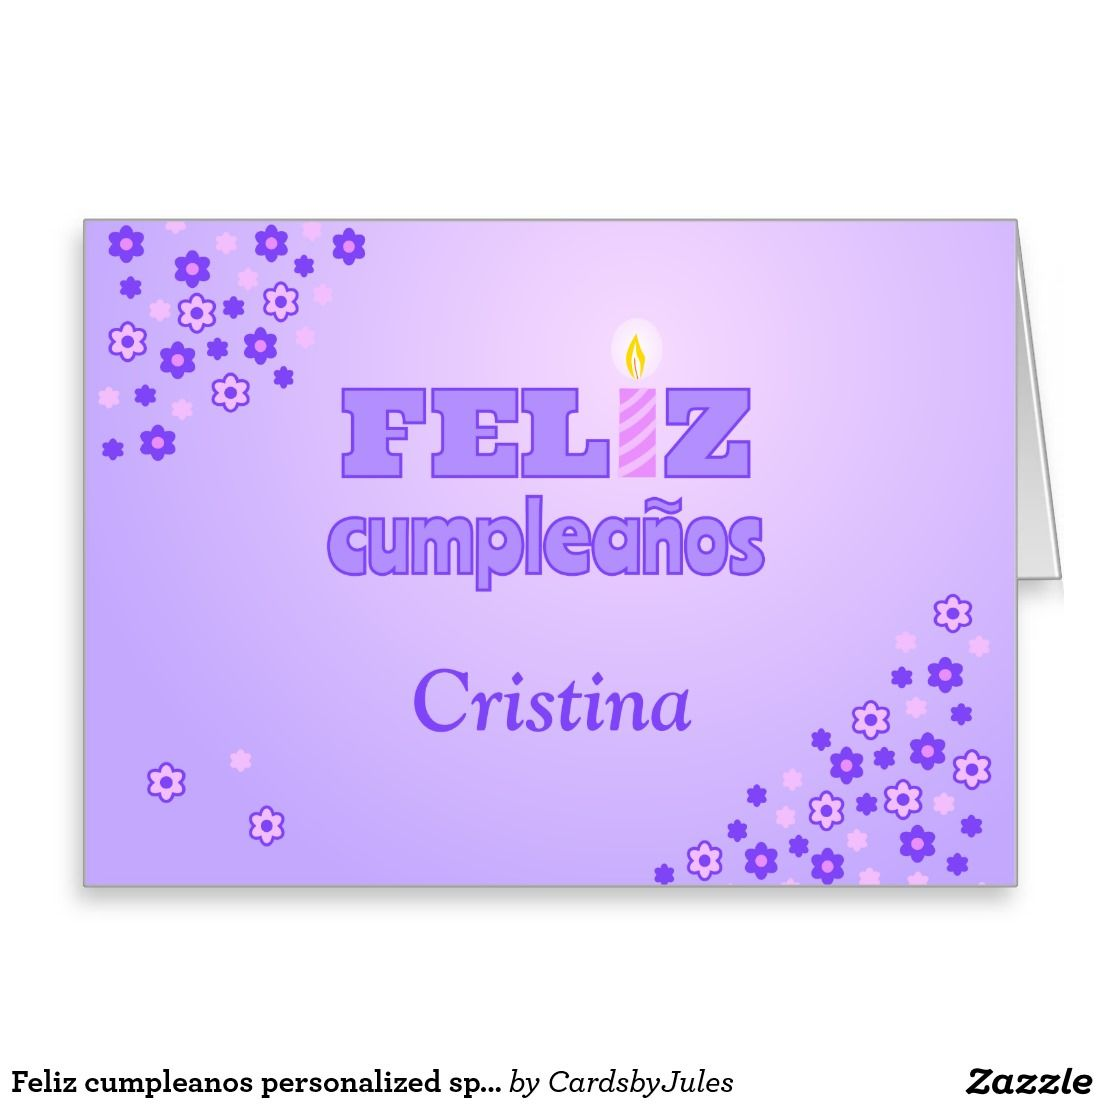 Feliz Cumpleanos Personalized Spanish Birthday Card Zazzle Co Uk Spanish Birthday Cards Birthday Greeting Cards Special Birthday Cards